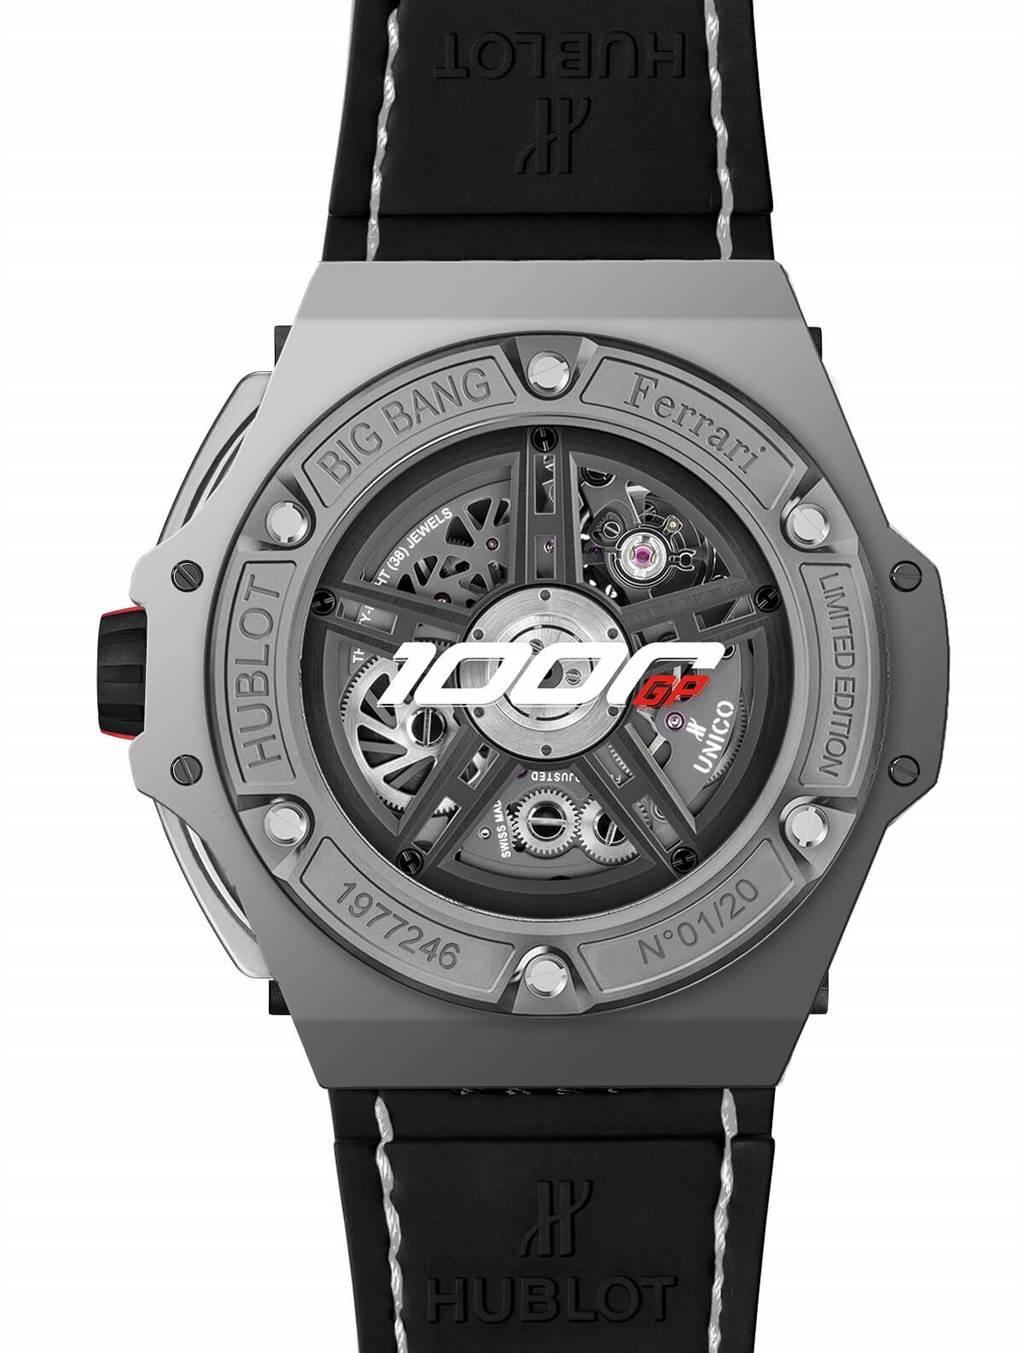 HUBLOT宇舶錶歡慶Ferrari車隊參與第1000場GP賽事 推出全新BIG BANG Ferrari 1000 GP紀念錶